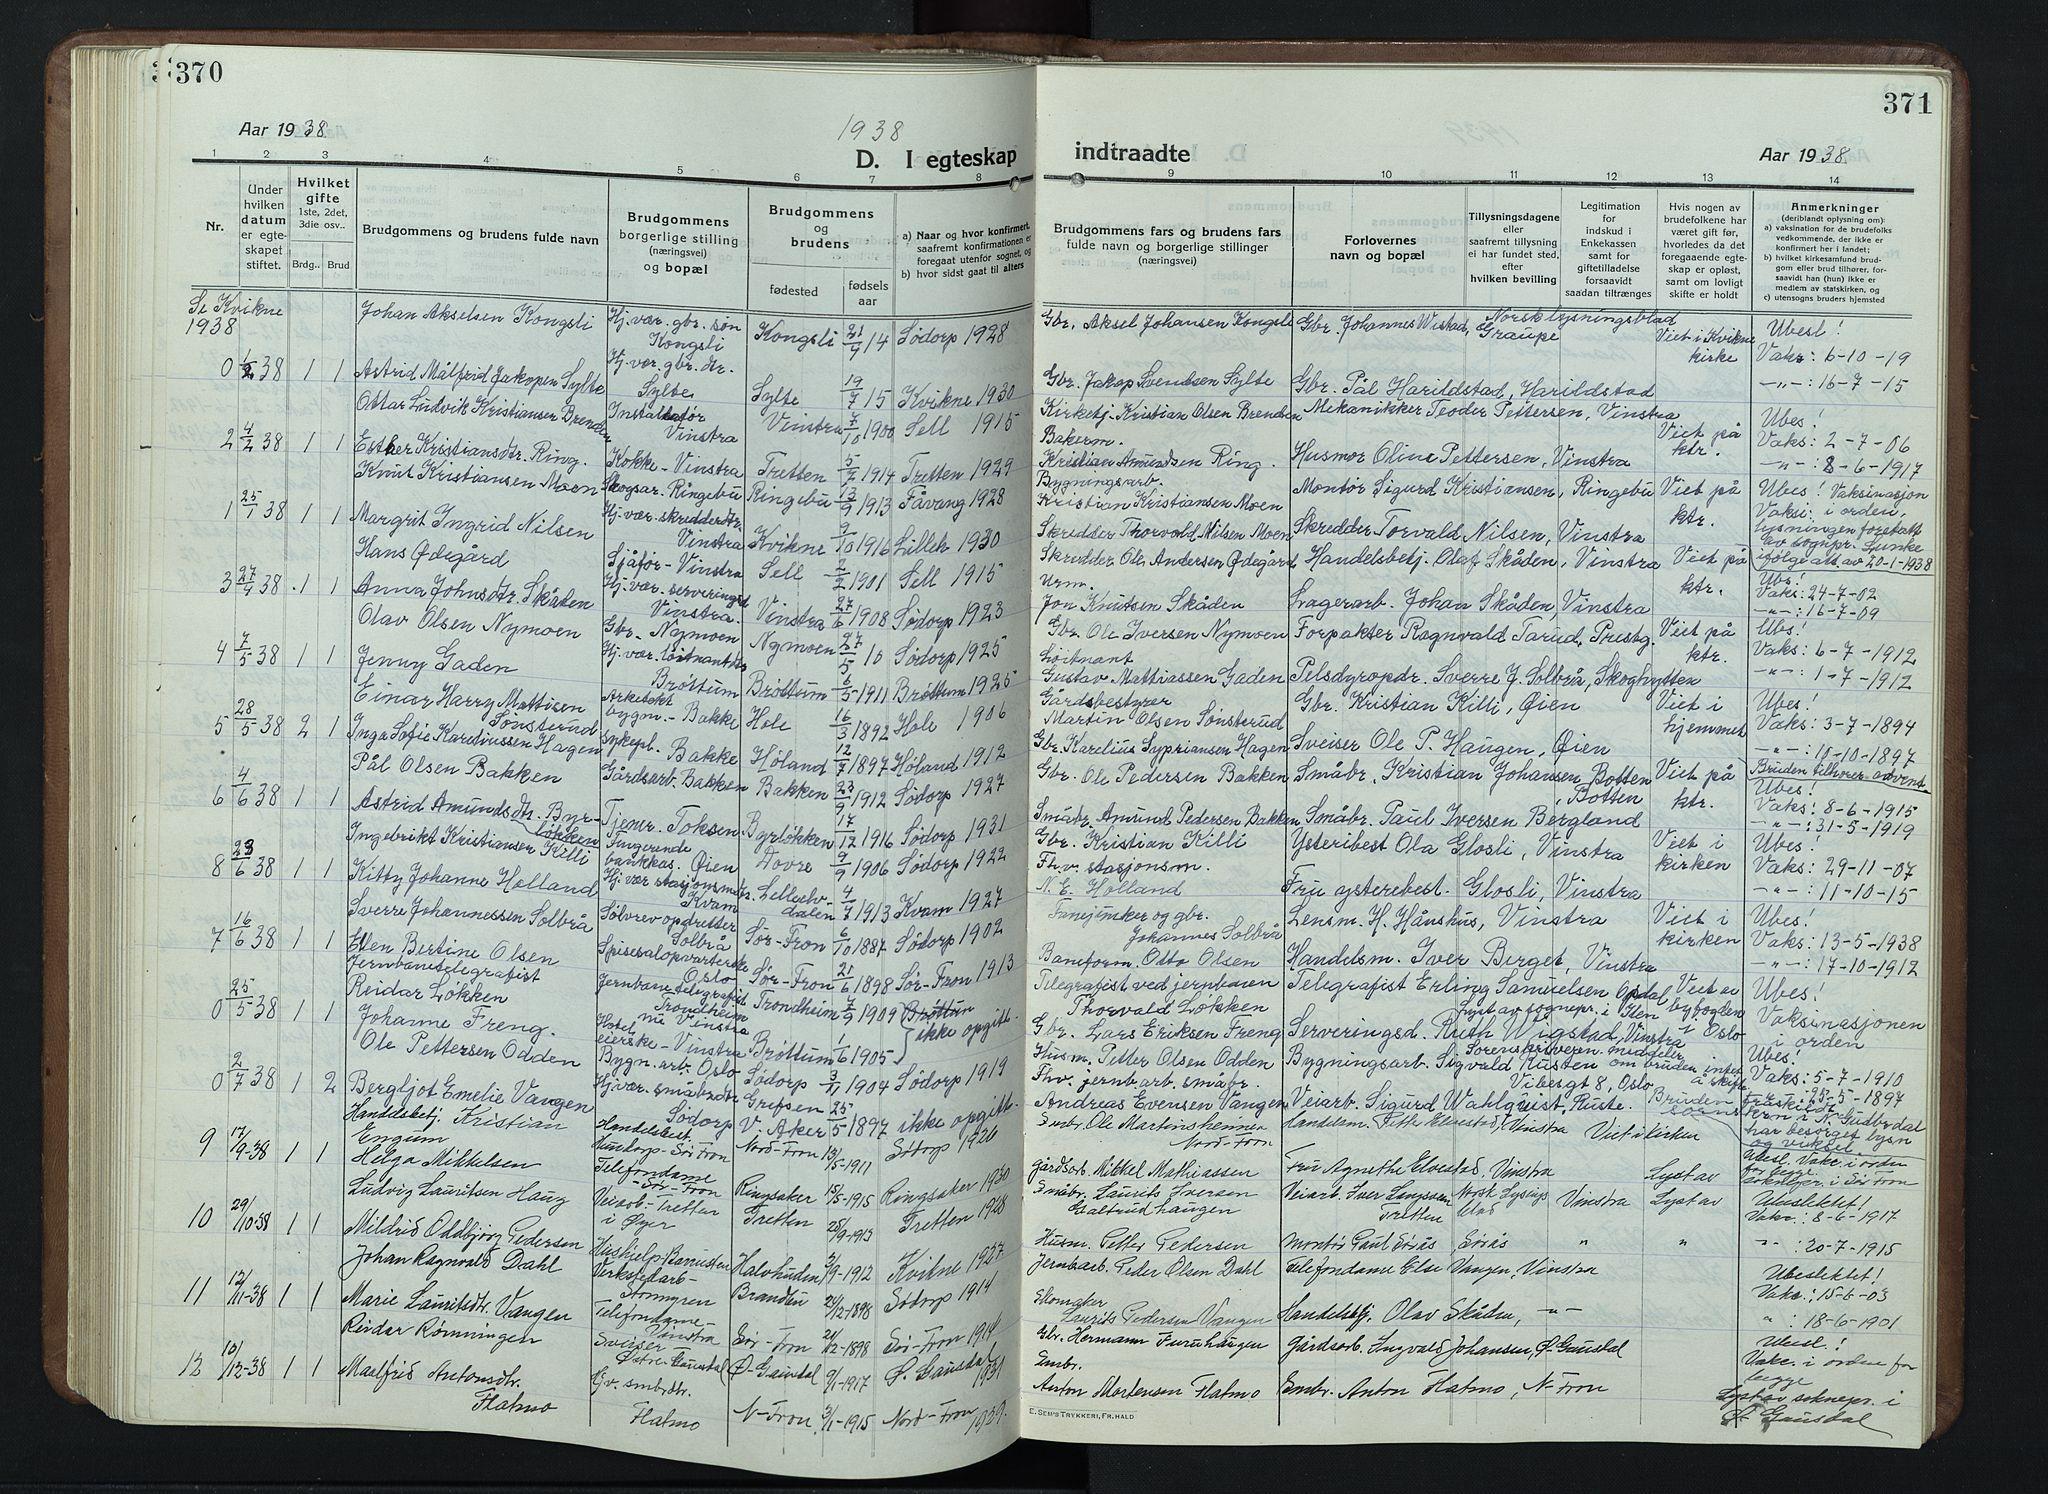 SAH, Nord-Fron prestekontor, Klokkerbok nr. 7, 1915-1946, s. 370-371